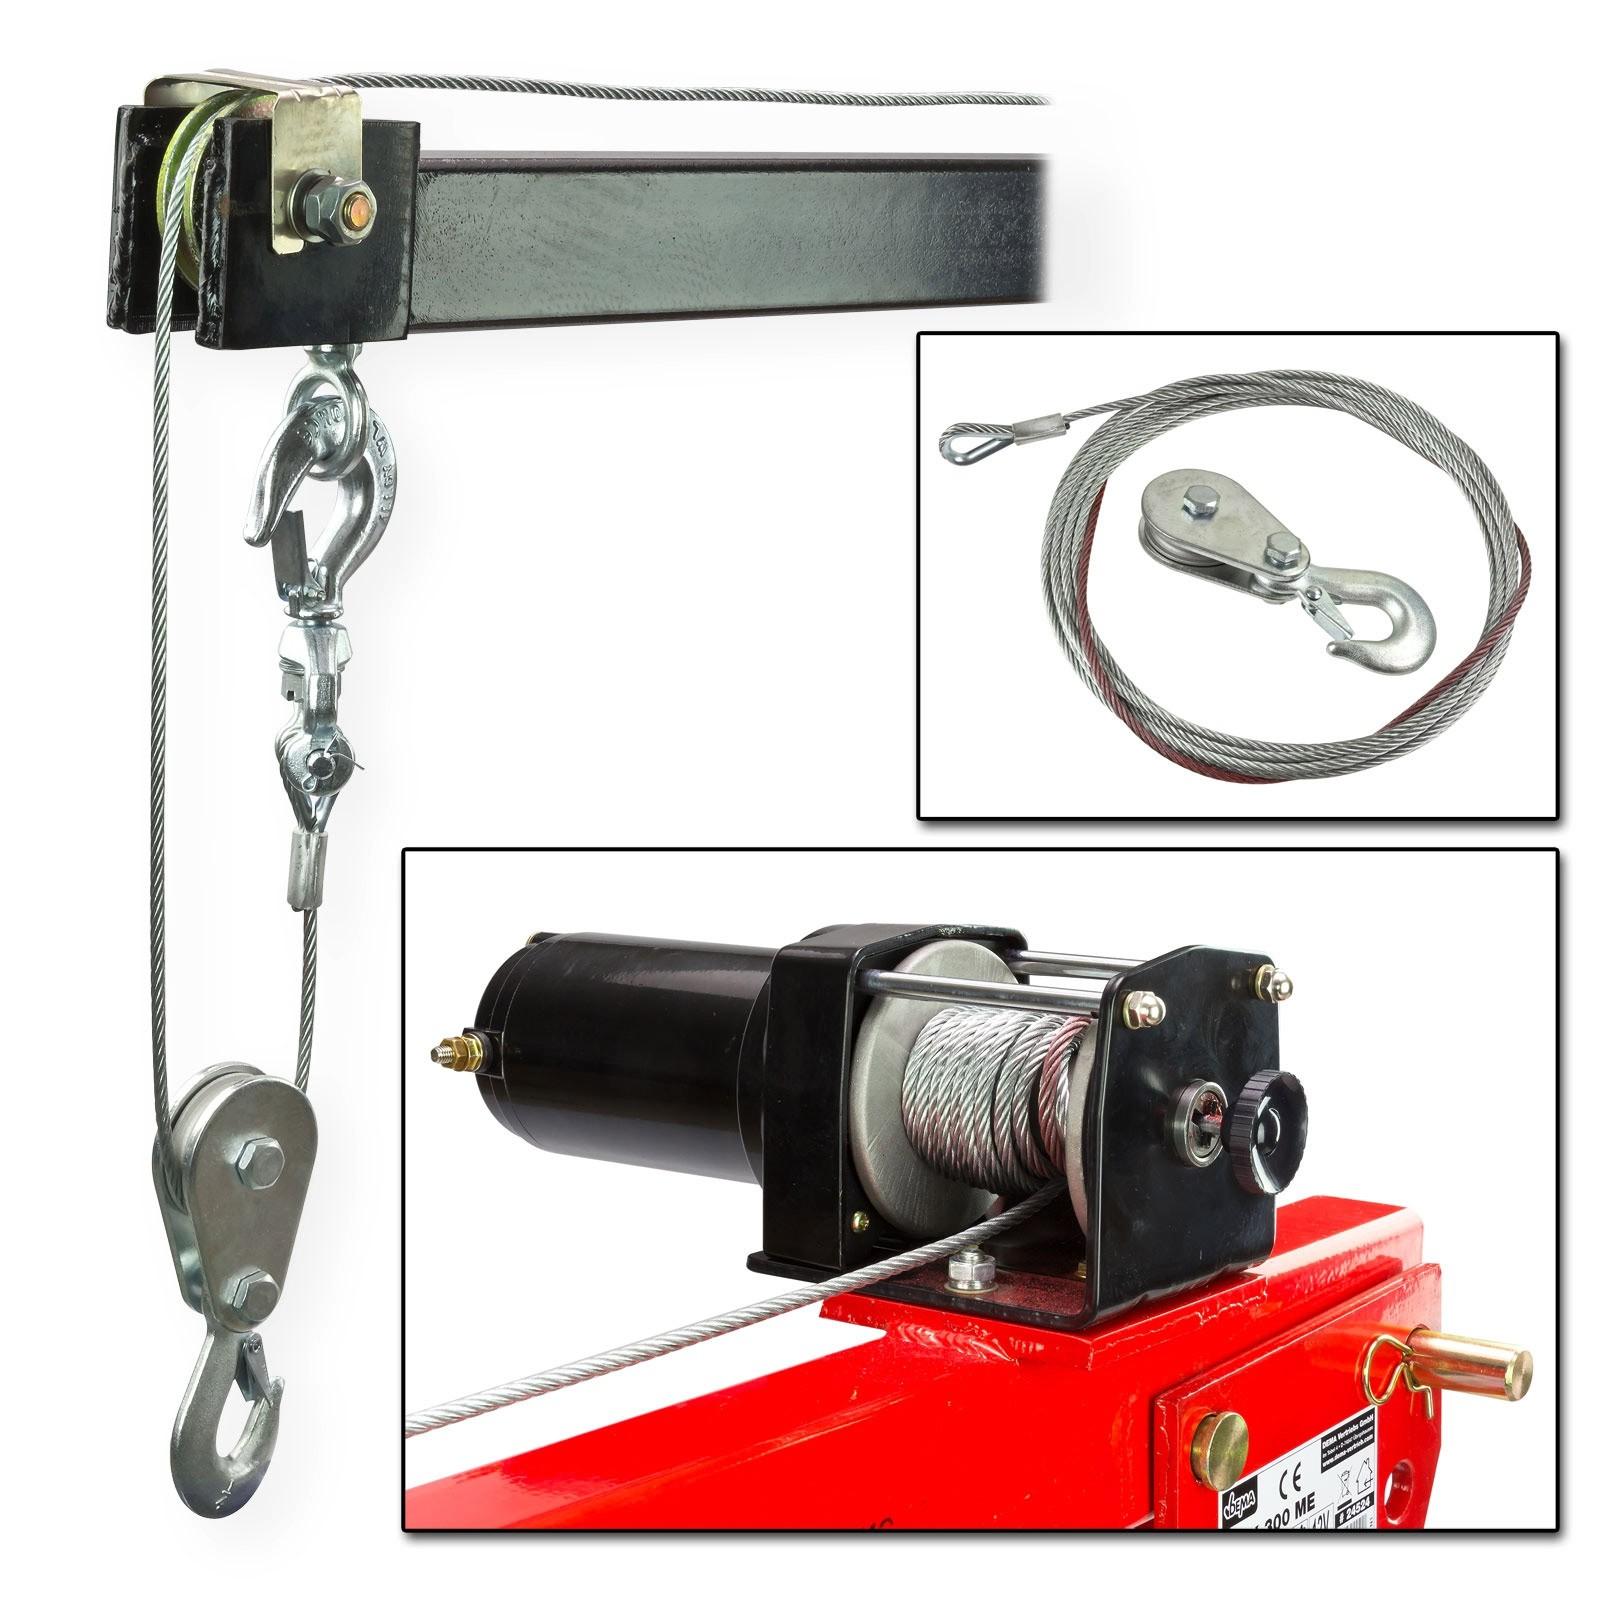 pickup kran autokran winch 300 mit 12 volt seilwinde. Black Bedroom Furniture Sets. Home Design Ideas